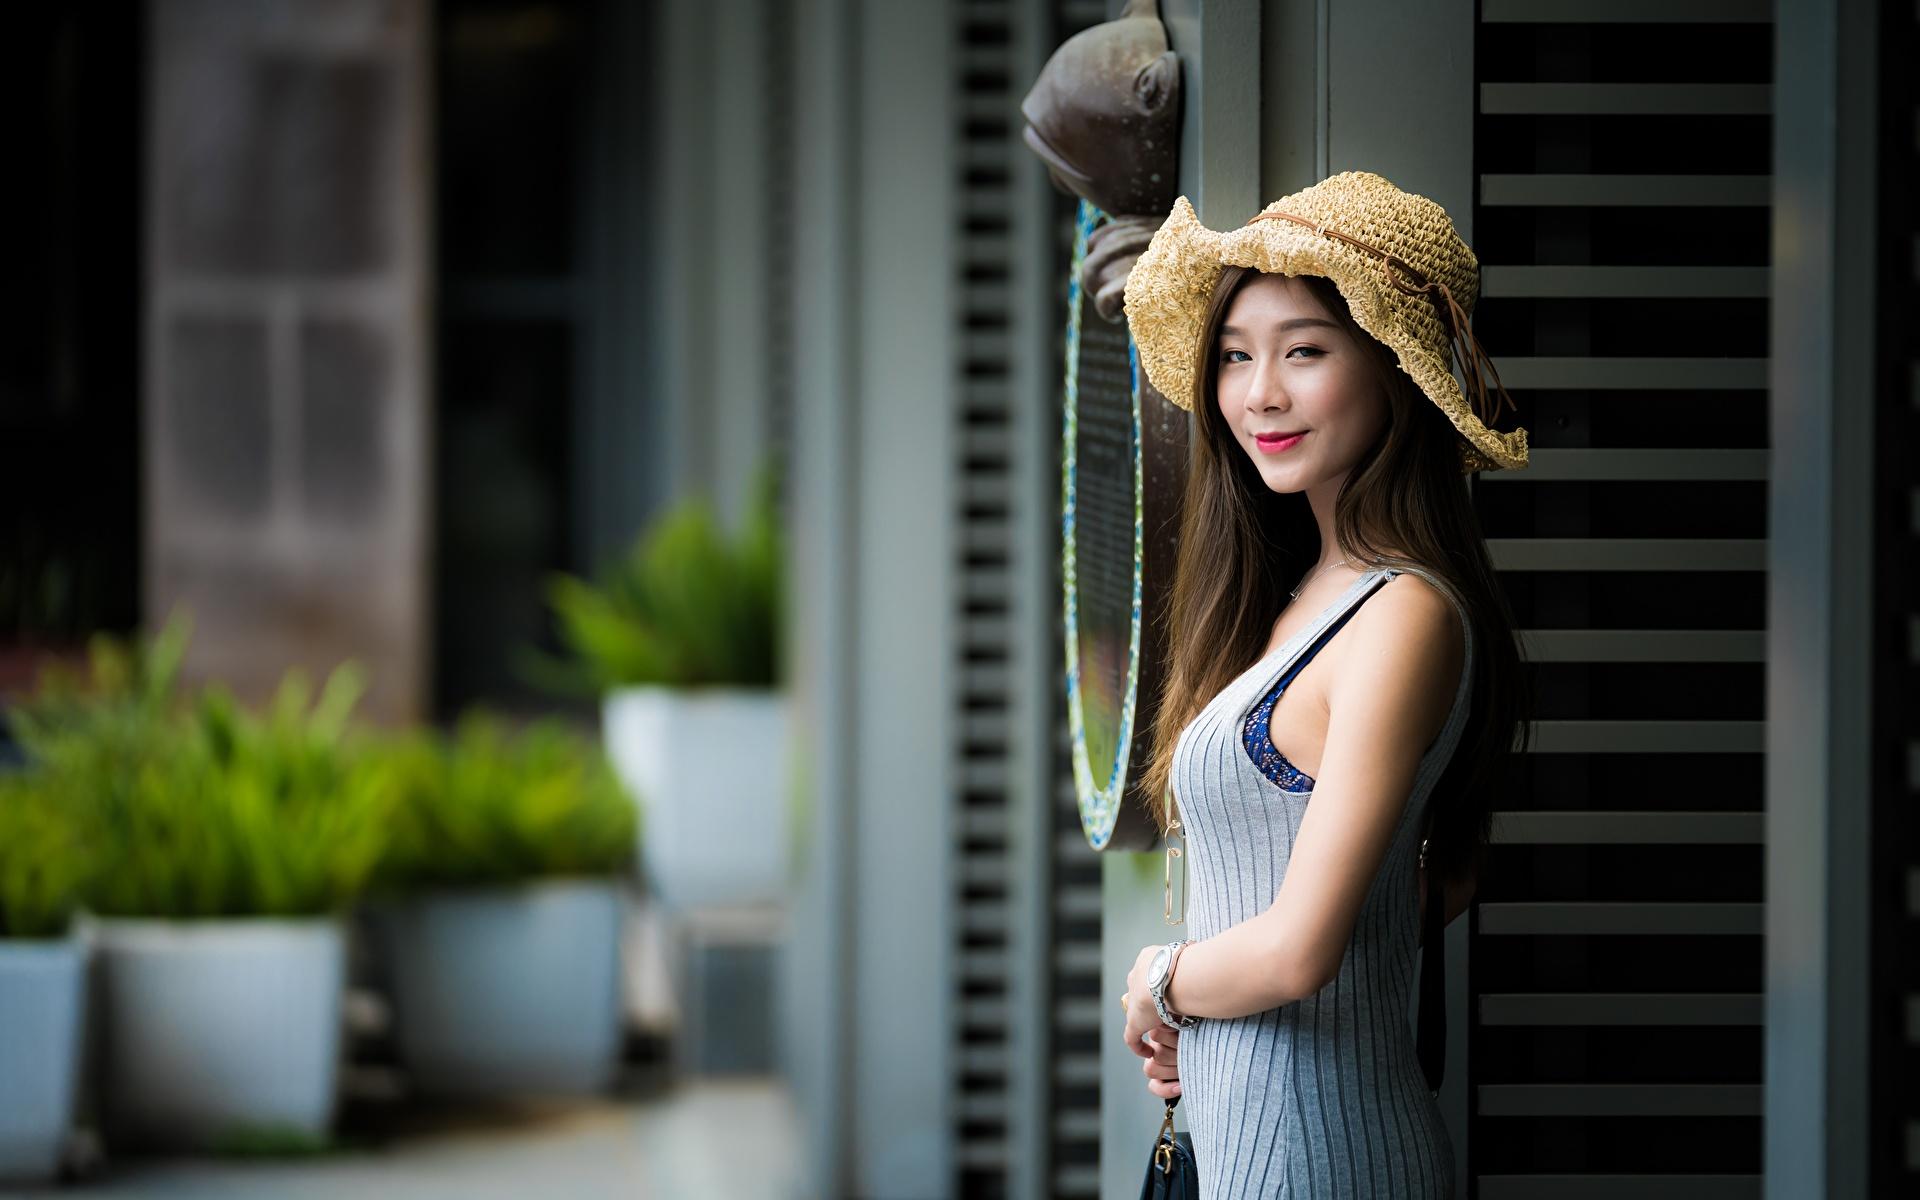 1920x1200、アジア人、ボケ写真、帽子、微笑み、手、若い女性、少女、